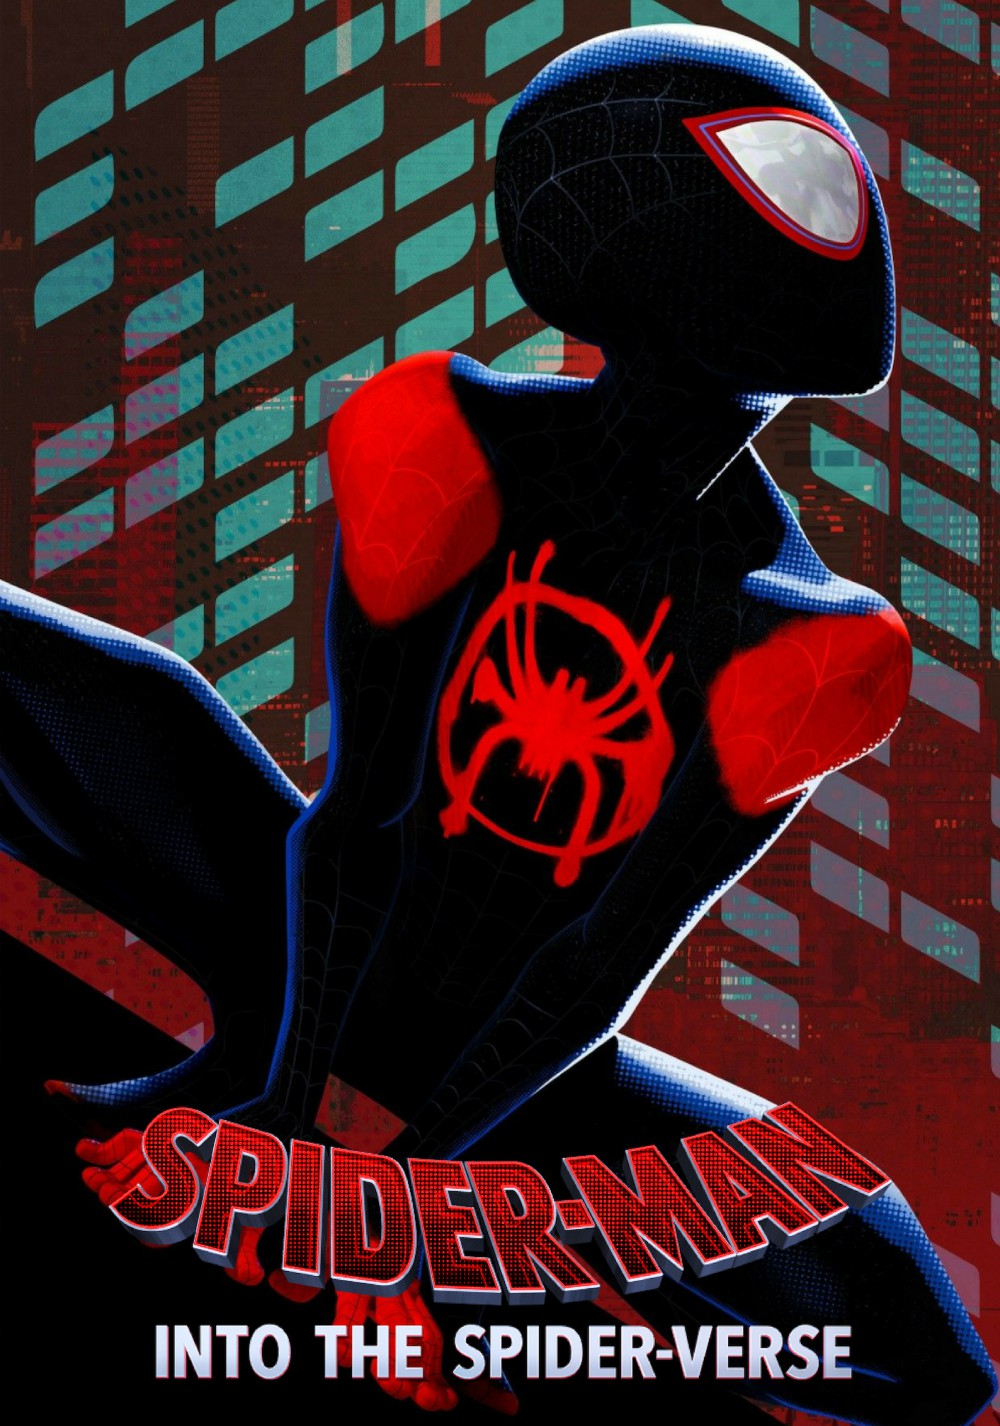 Spider man Into the Spider Verse 2018 jordan subtitles Srt